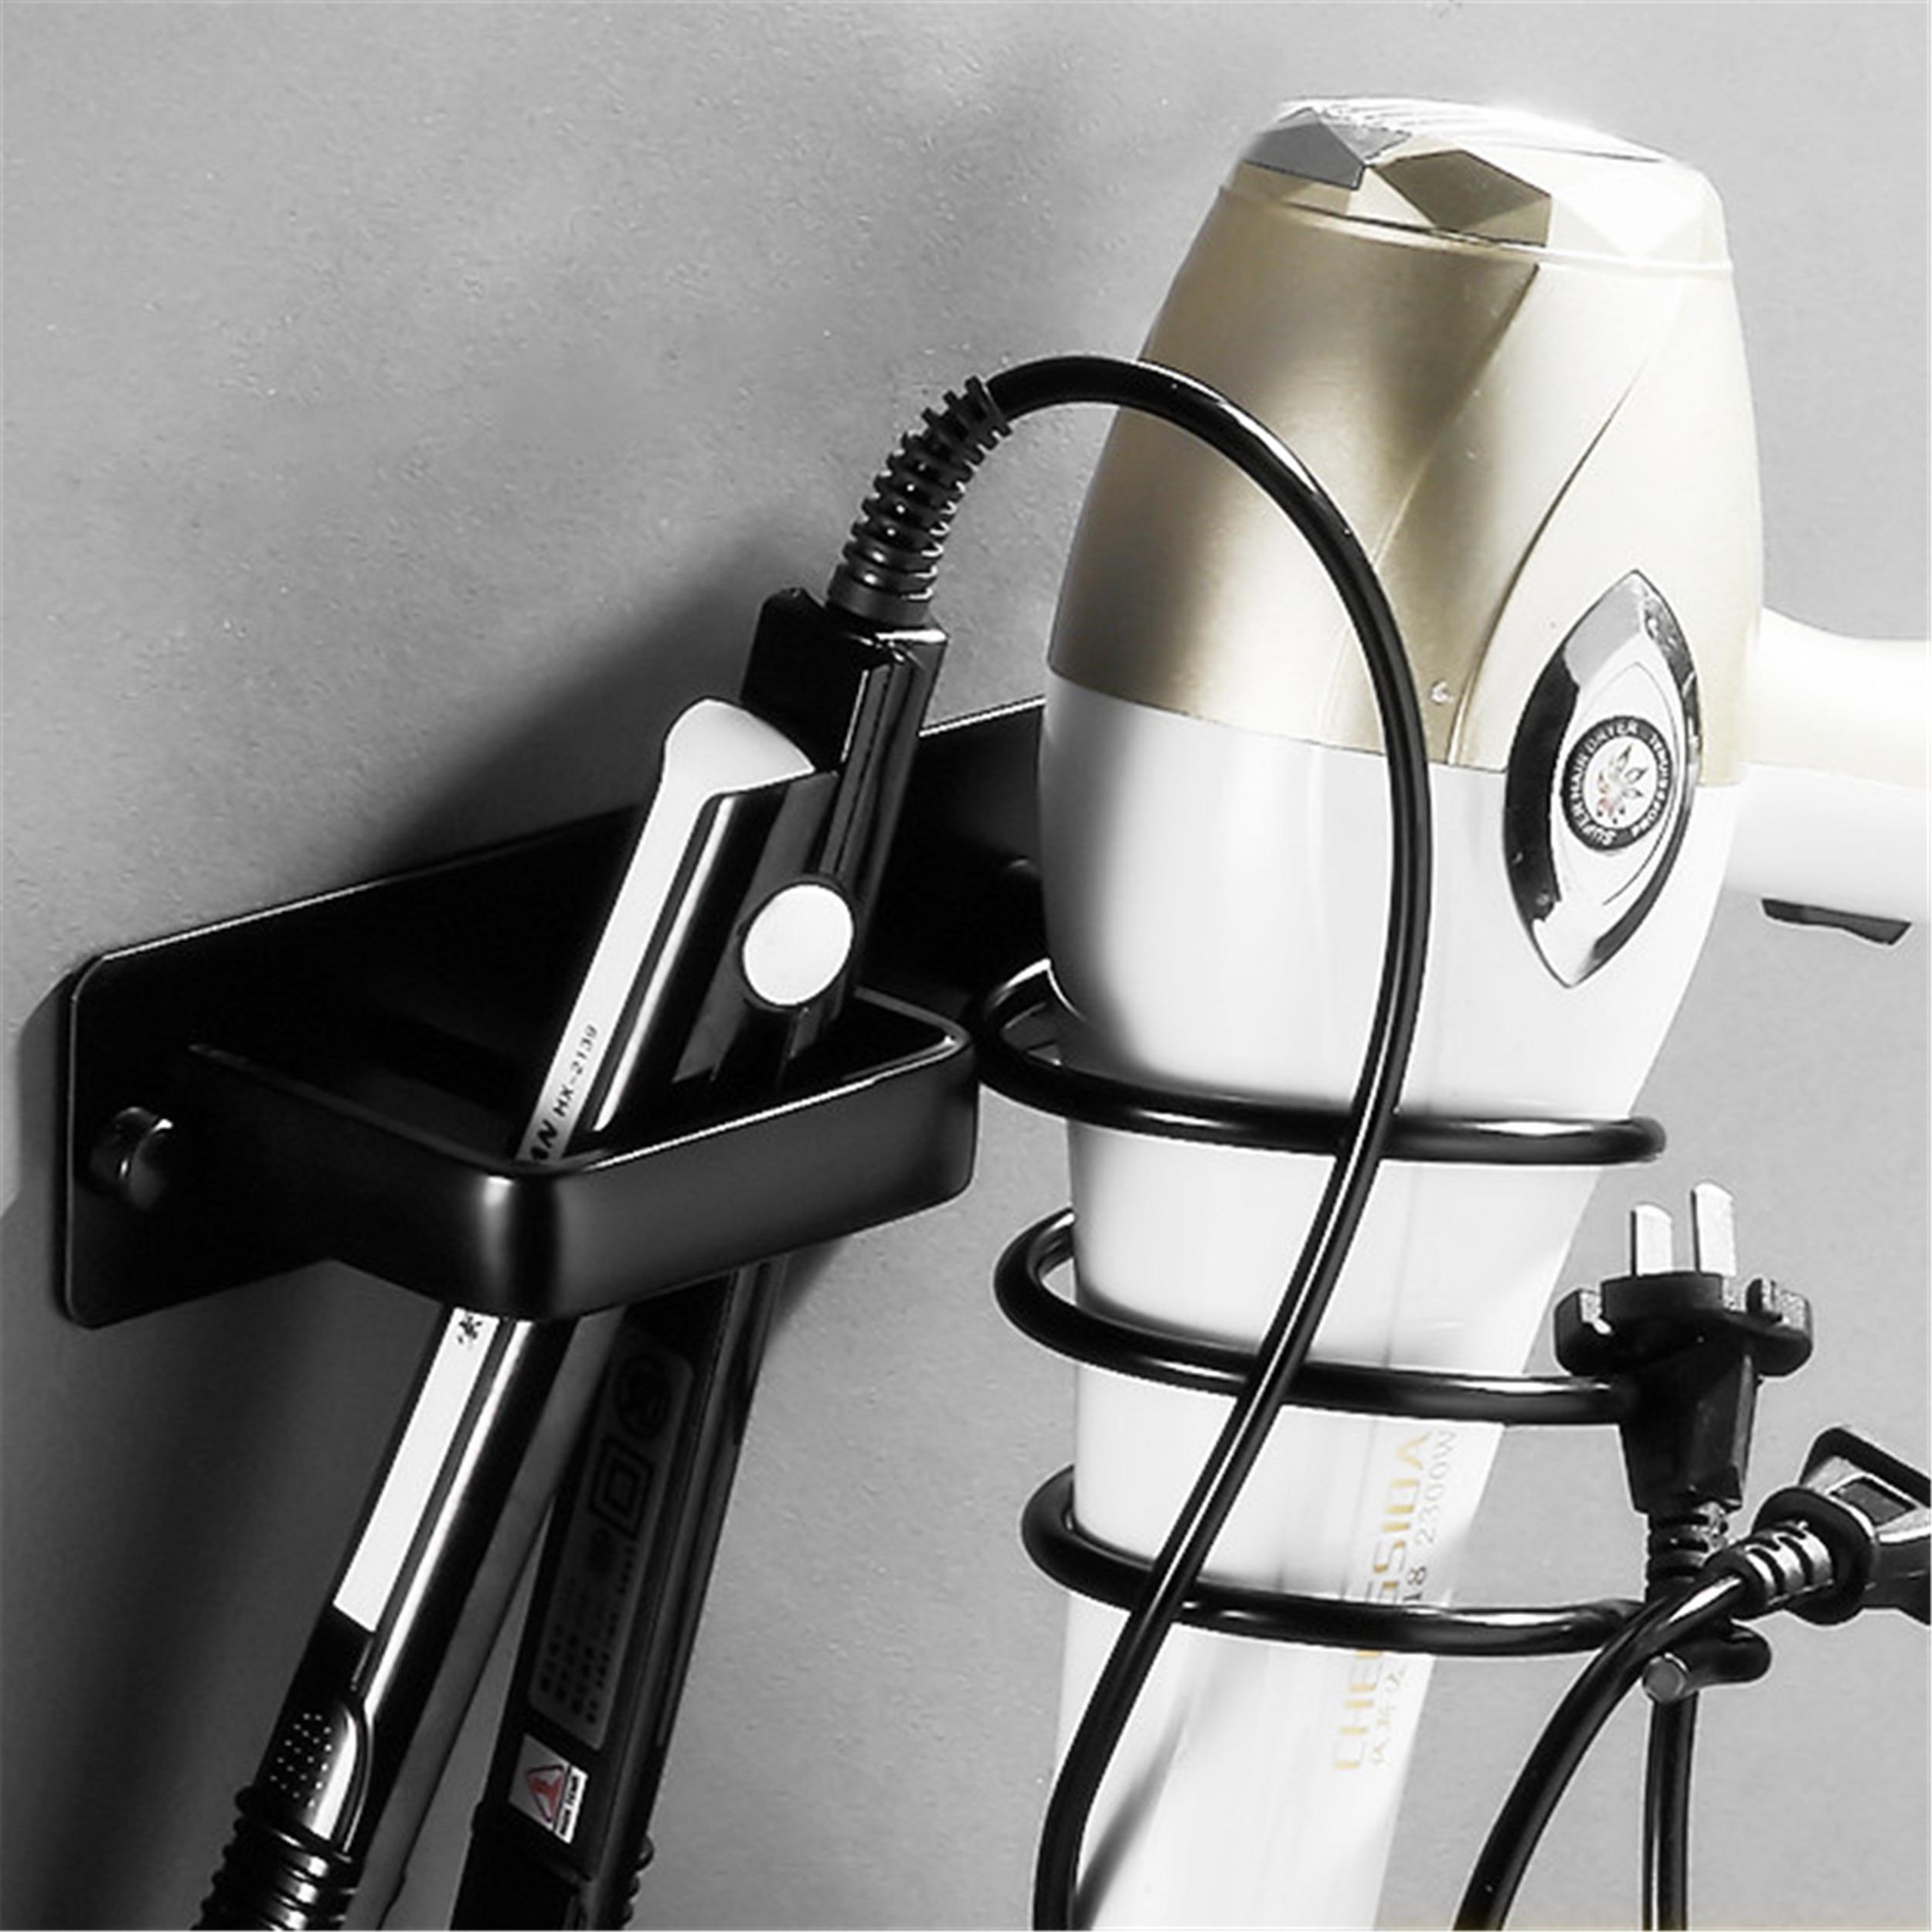 Wall Mounted Bathroom Black Hair Dryer Holder Space Aluminum Hair Straightener Holder Storage Bathroom Shelf Accessories